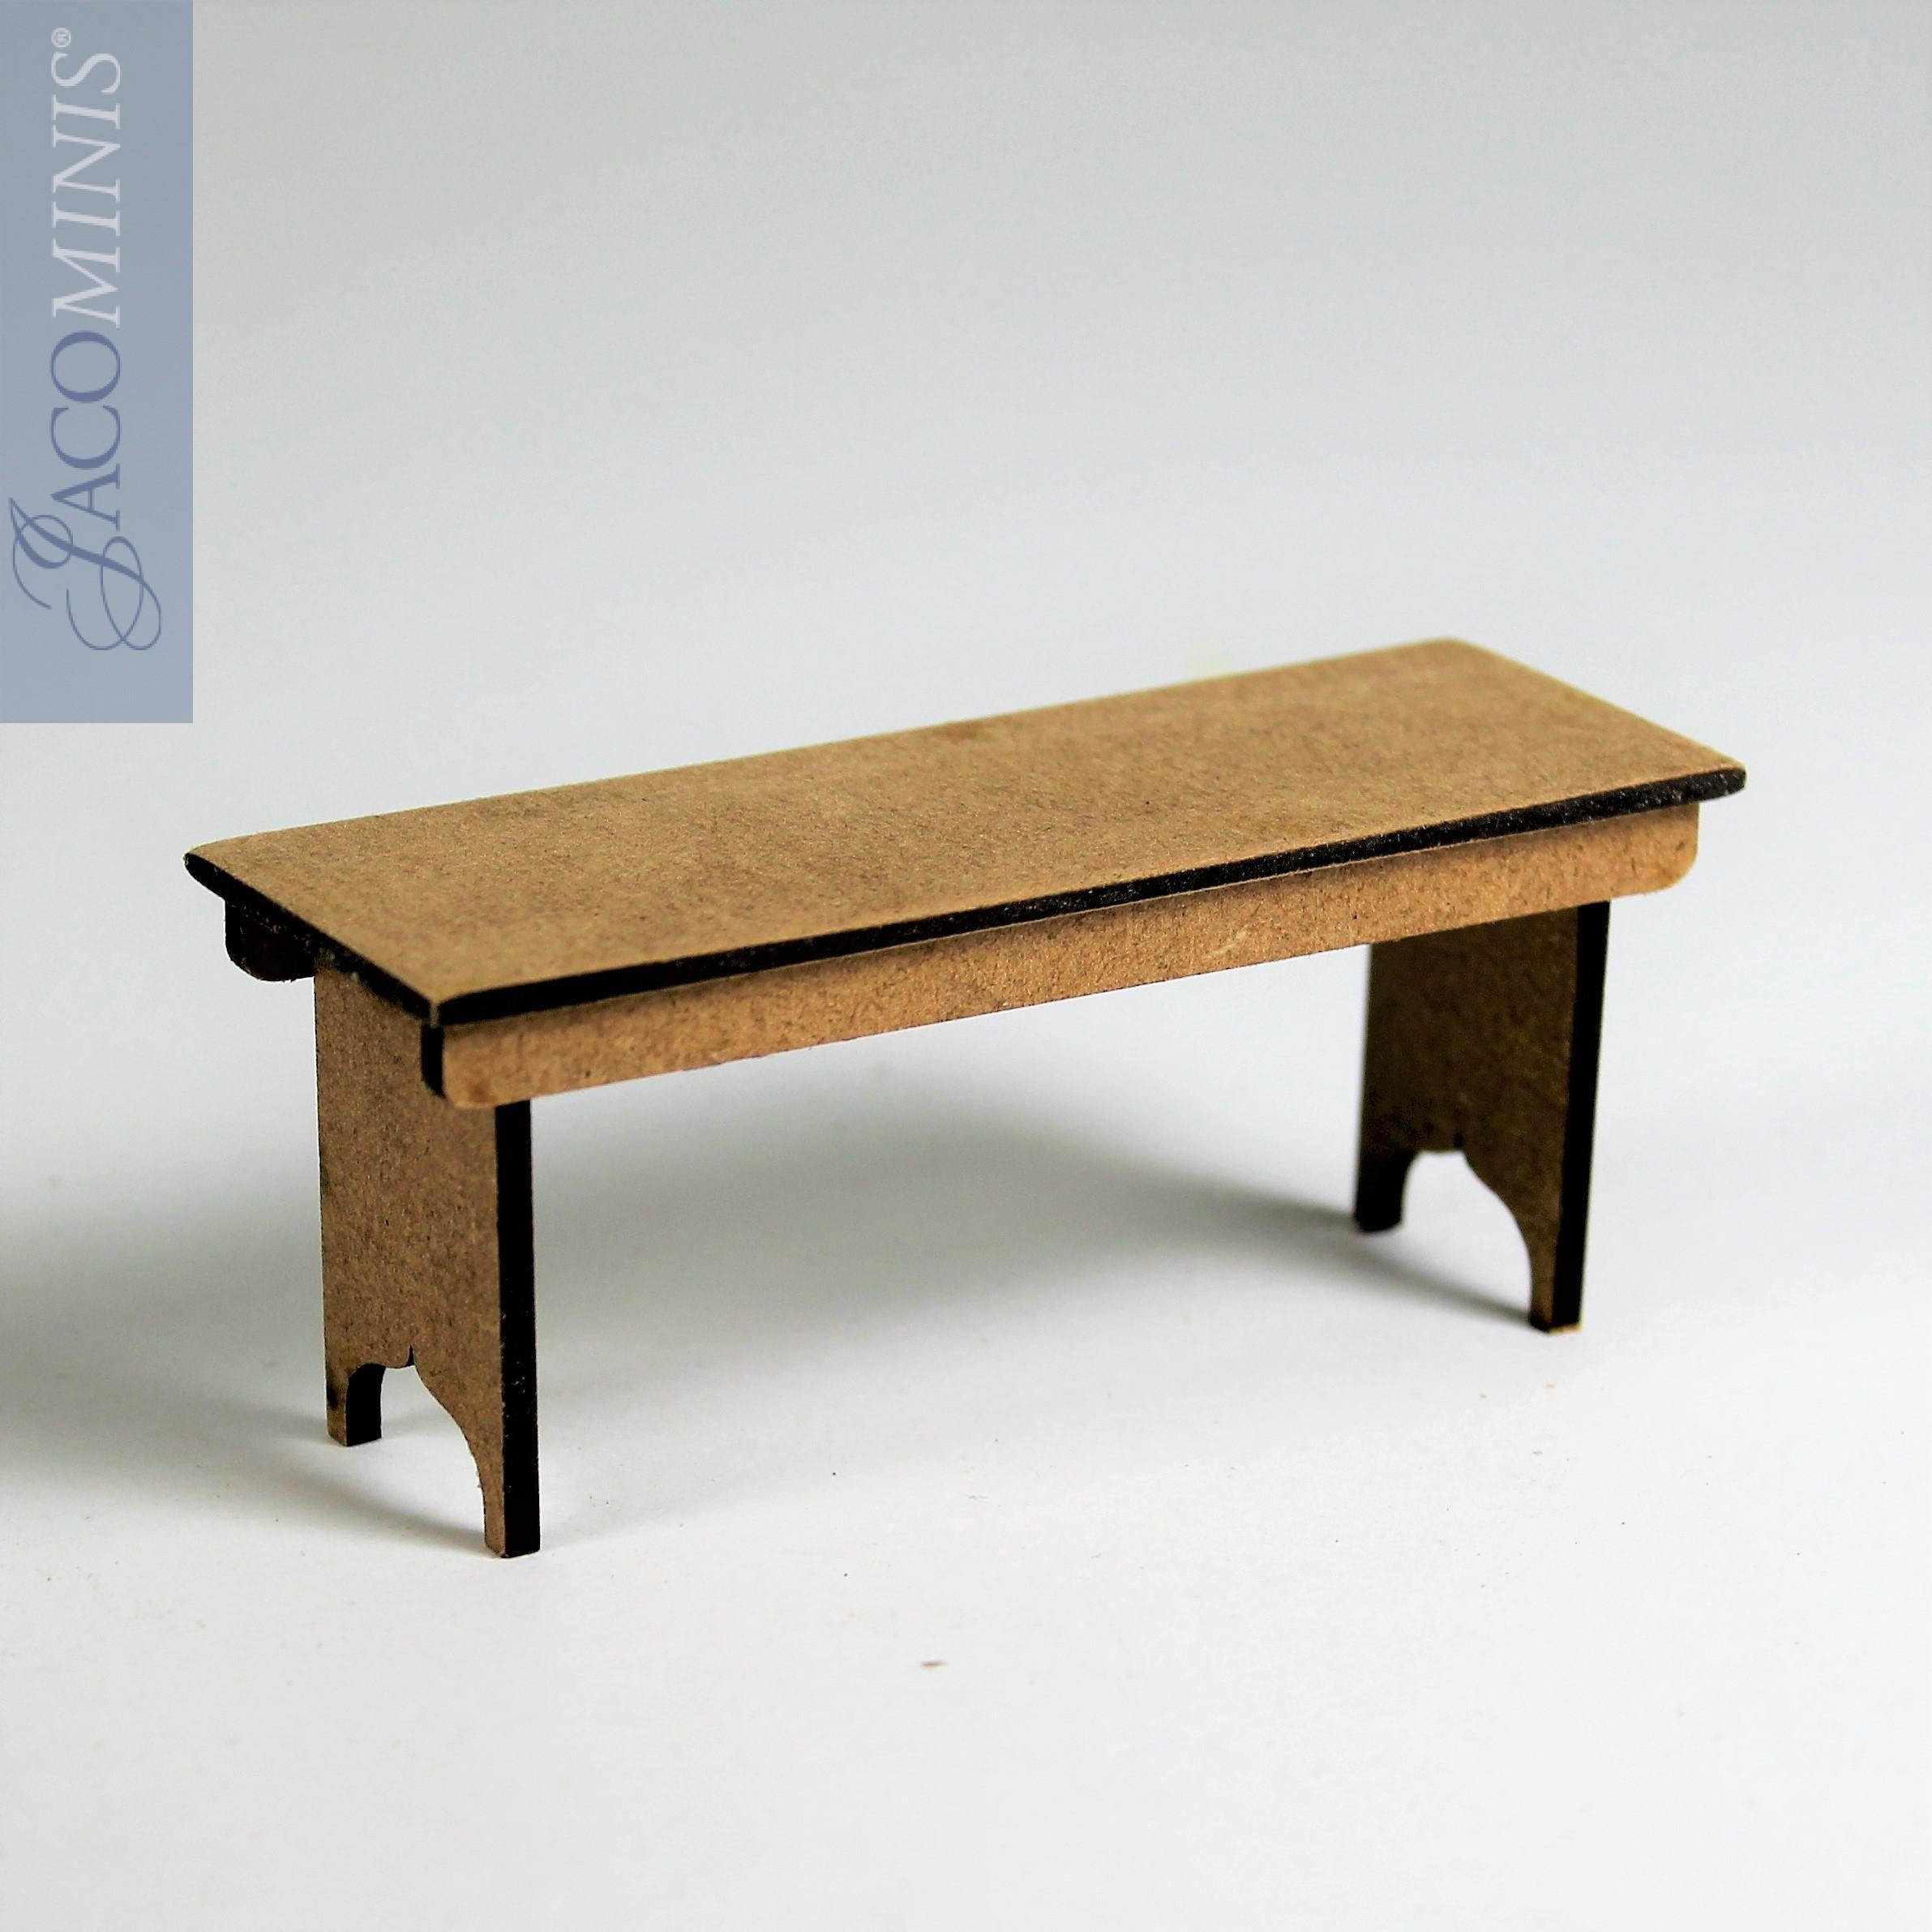 Viv 09 Small Bench Jacominis